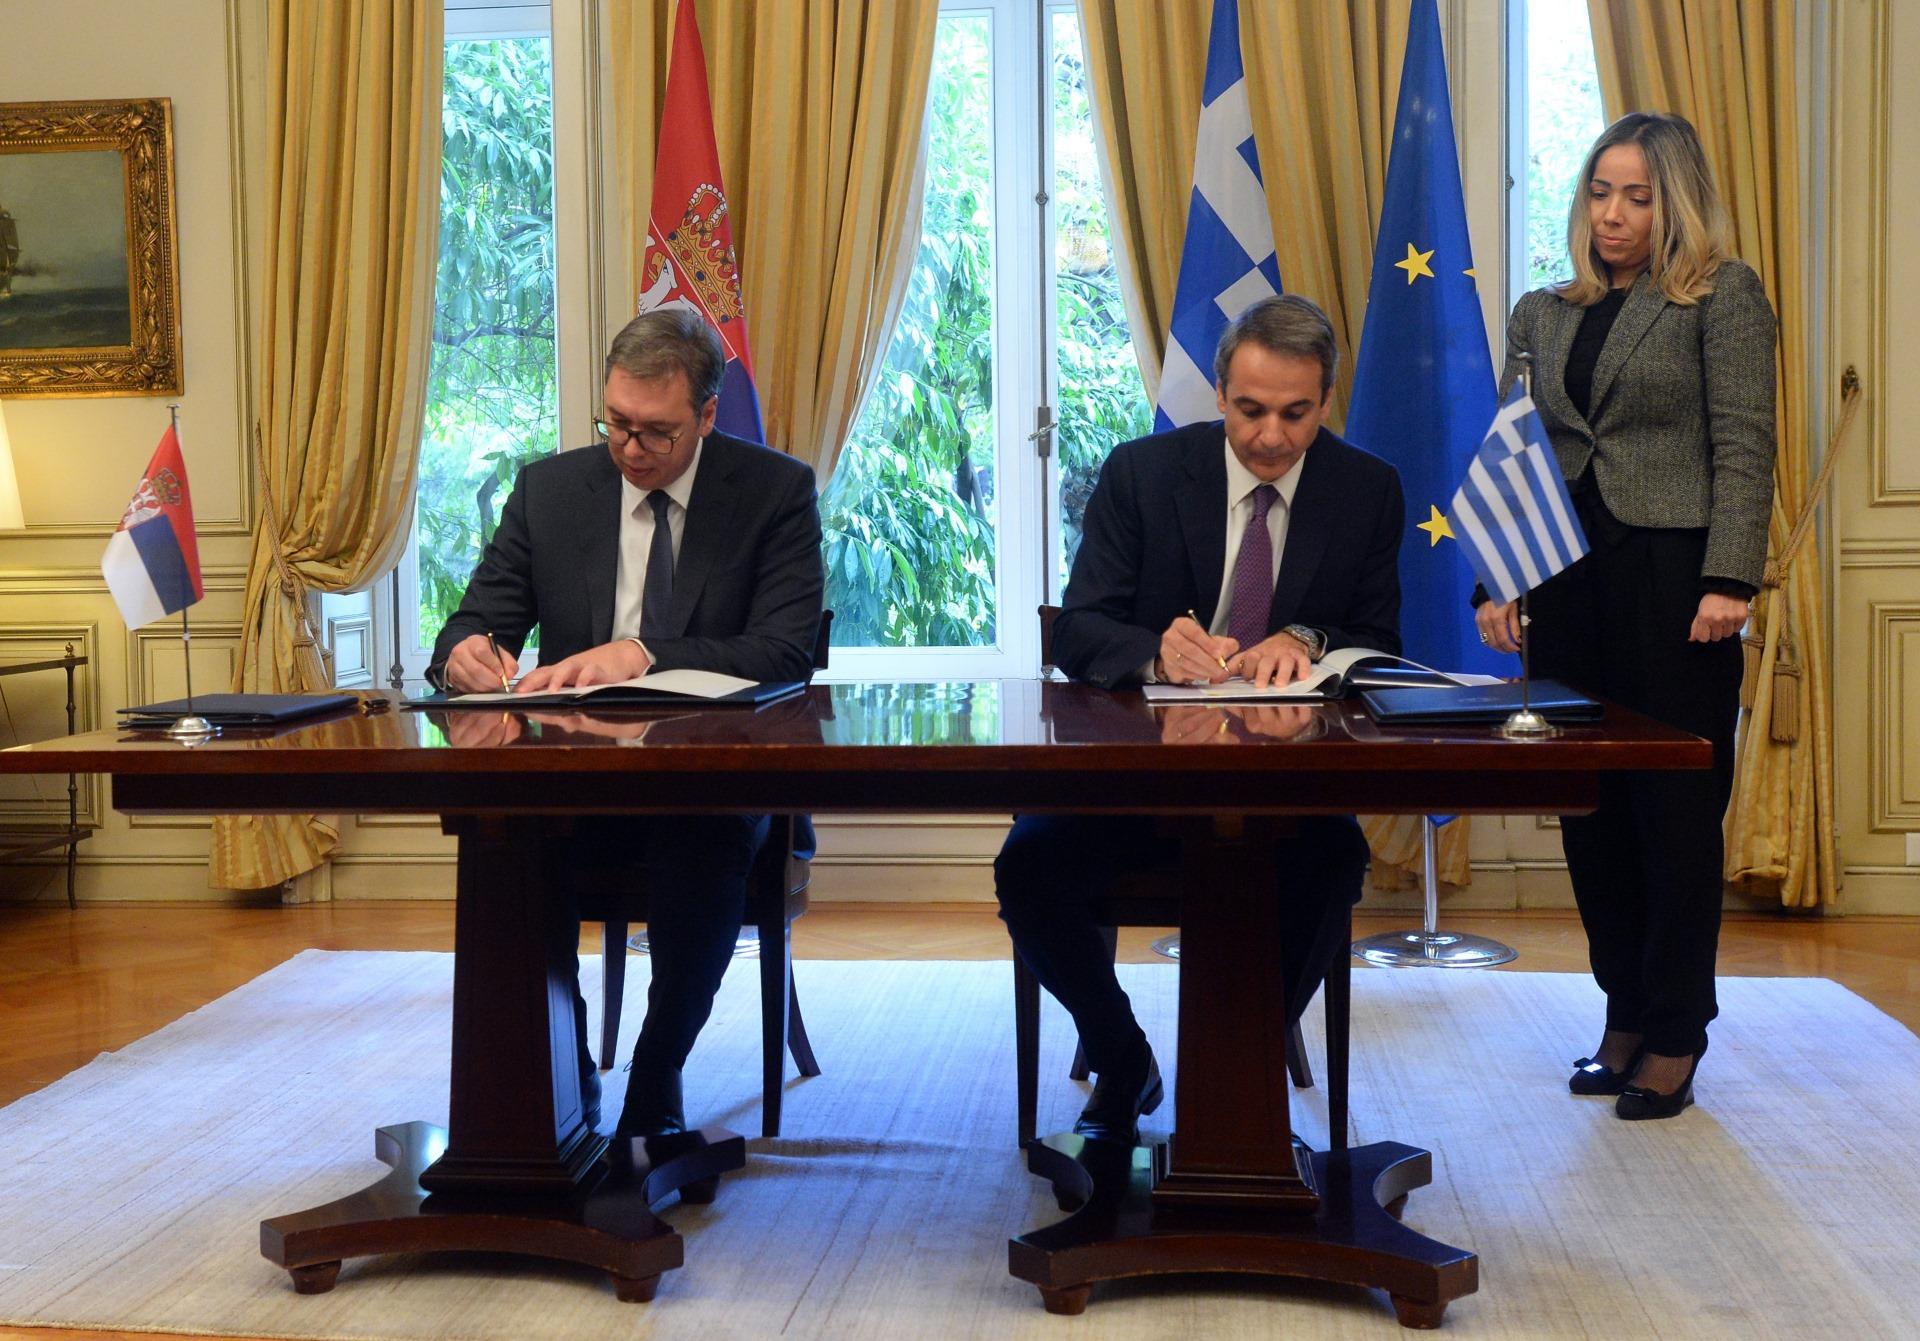 Predsednik Srbije Aleksandar Vucic sa grčkim premijerom Kirjakosom Micotakisom 3